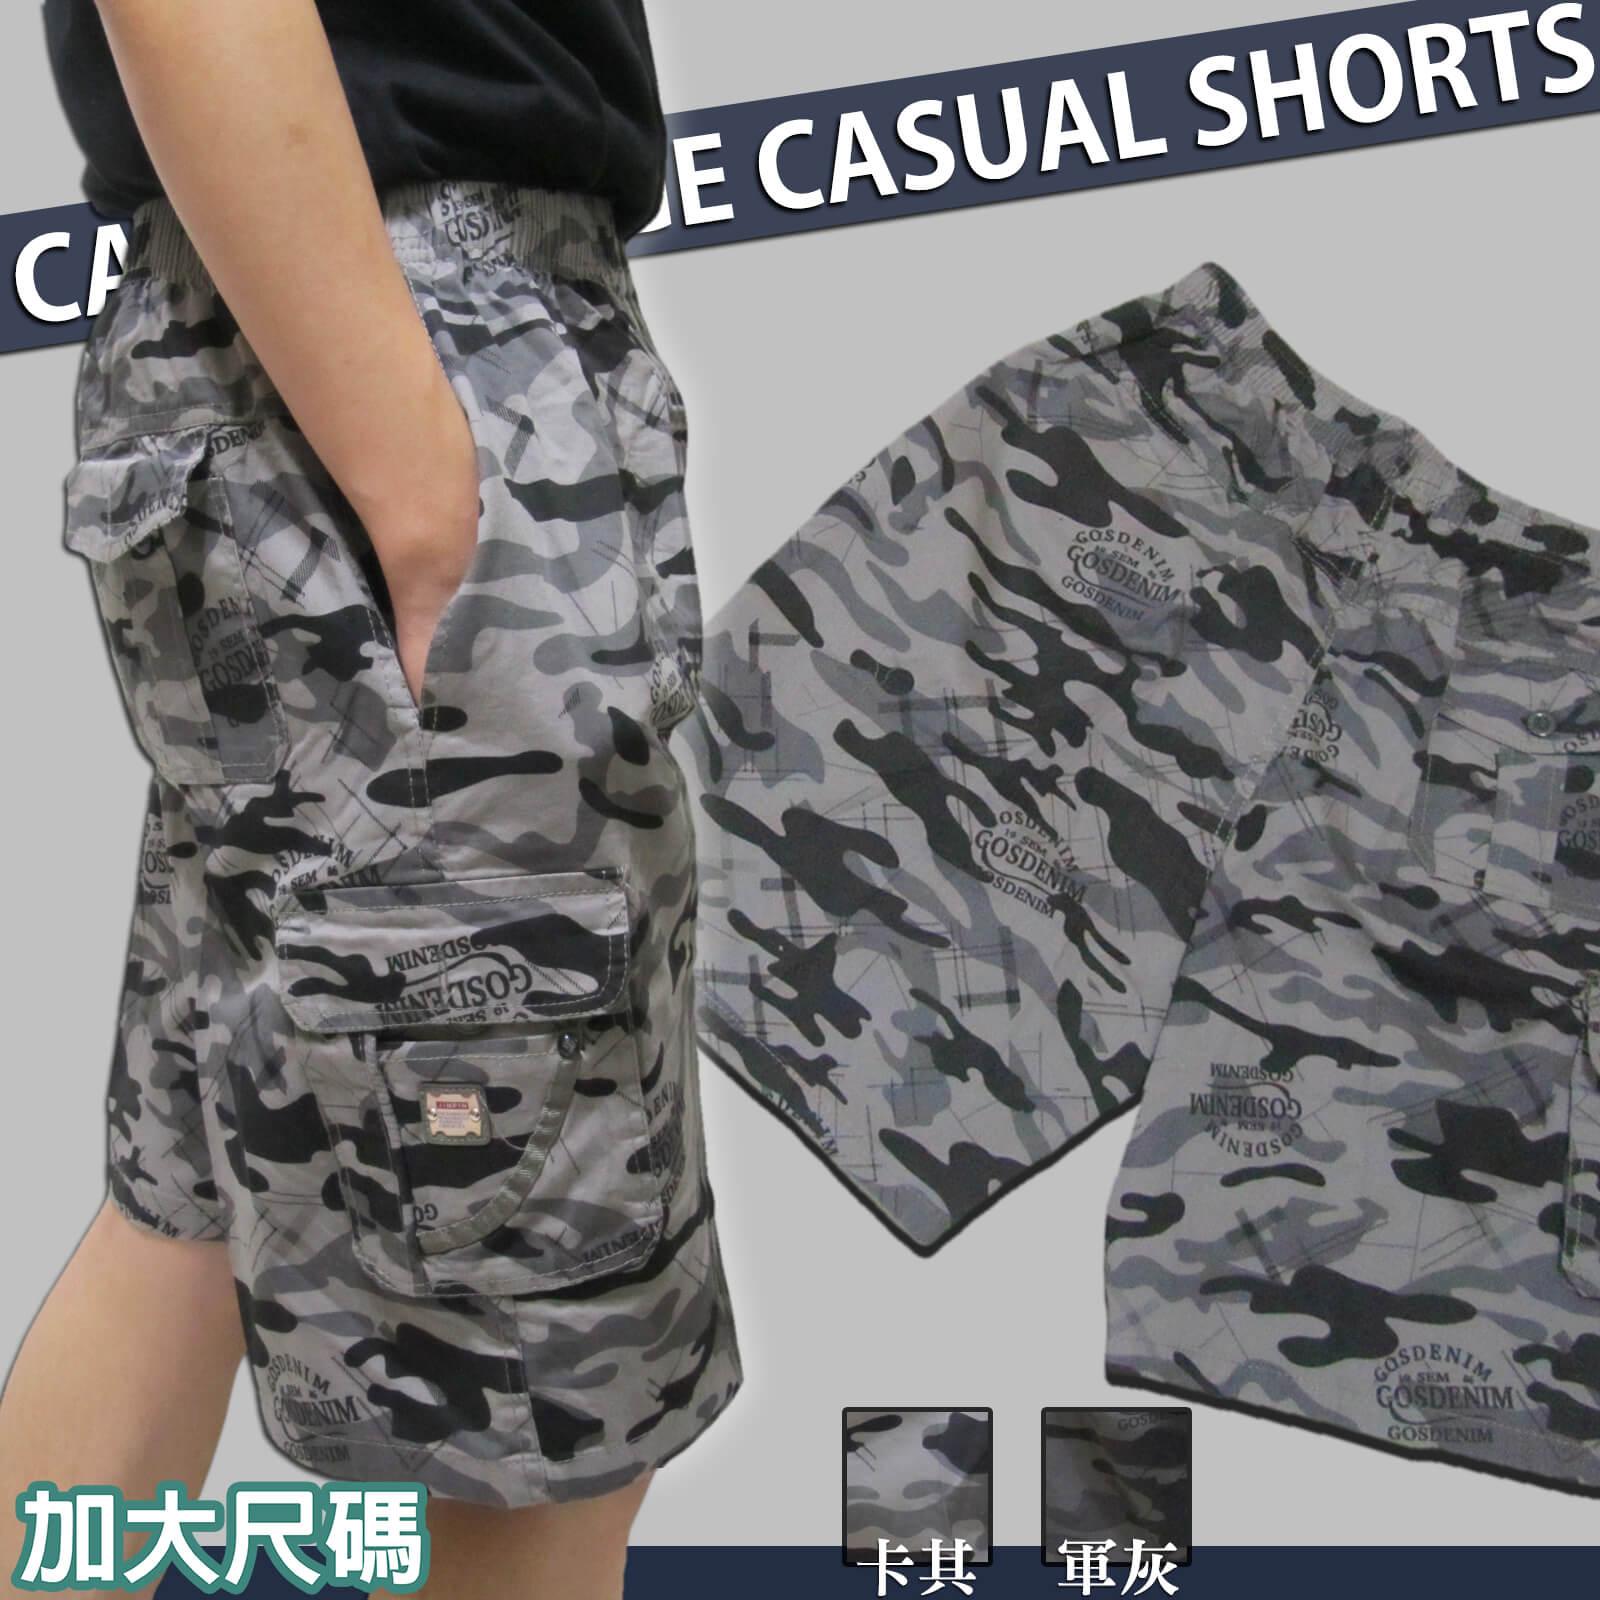 sun~e加大 迷彩五分褲、加大 迷彩短褲、全棉100%短褲、腰圍鬆緊休閒五分褲、加大 多